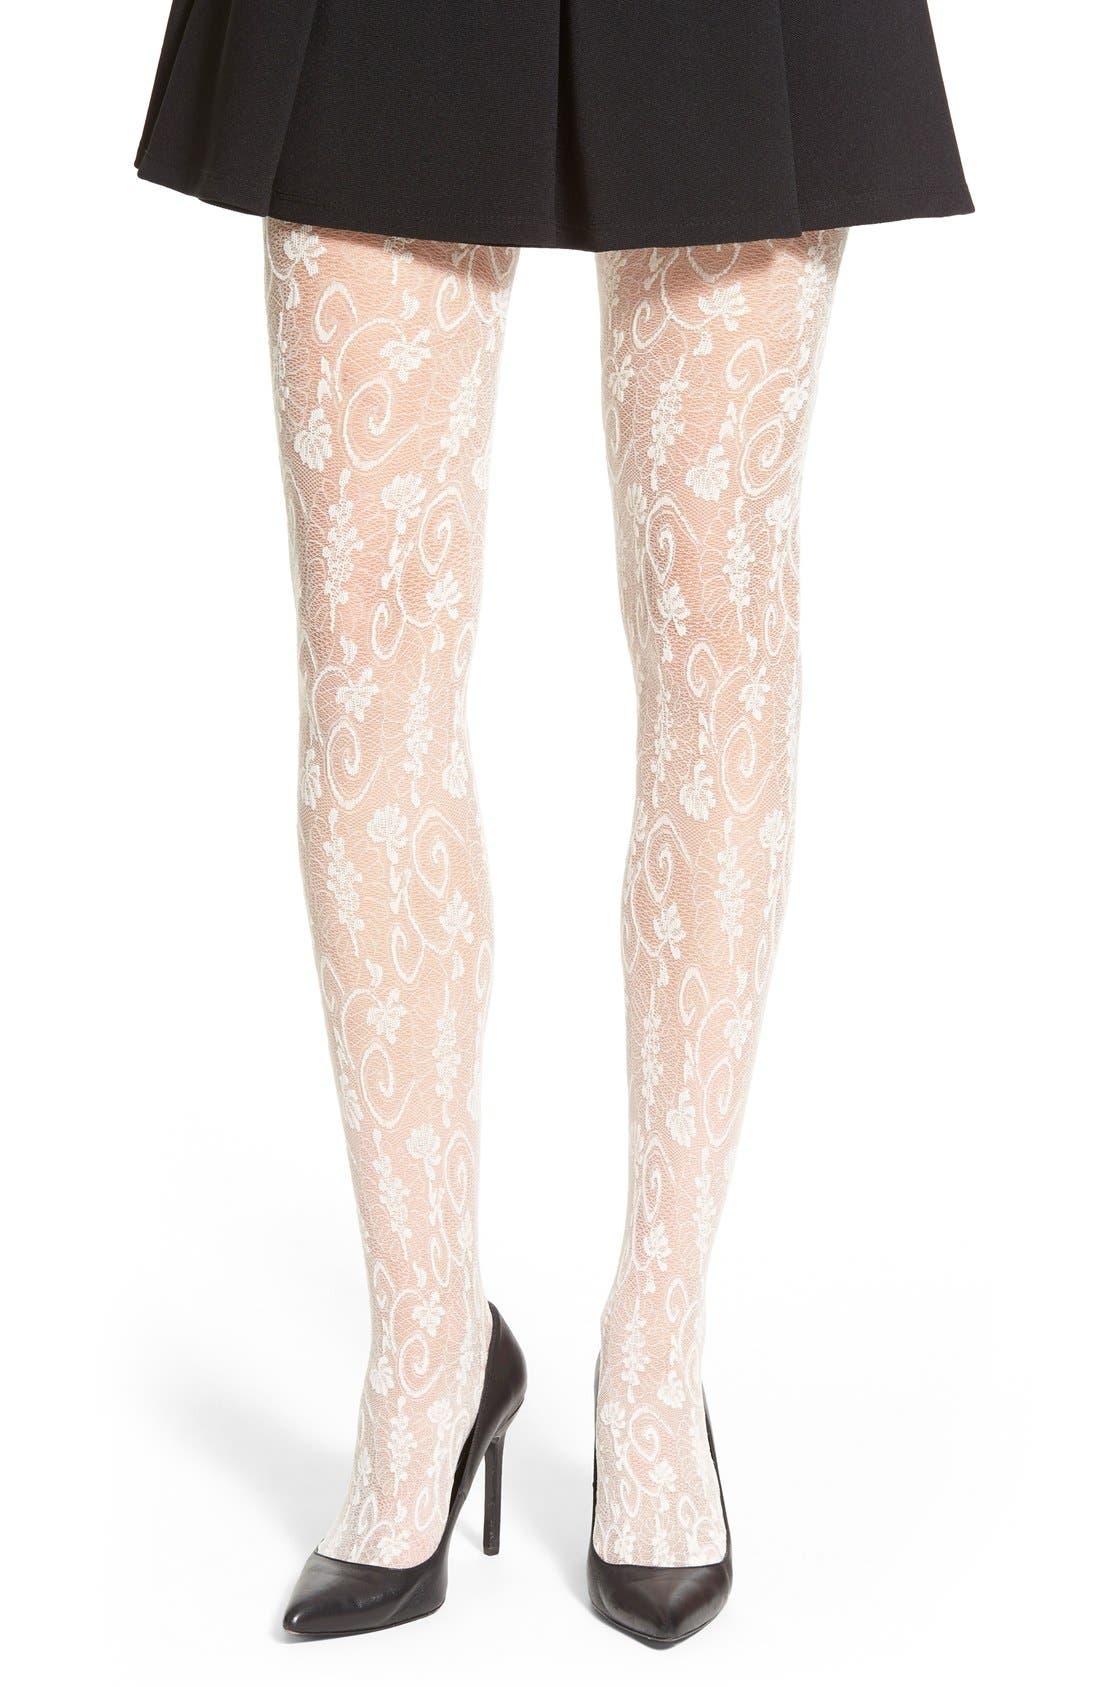 Alternate Image 1 Selected - Oroblu 'Estella' Floral Lace Tights